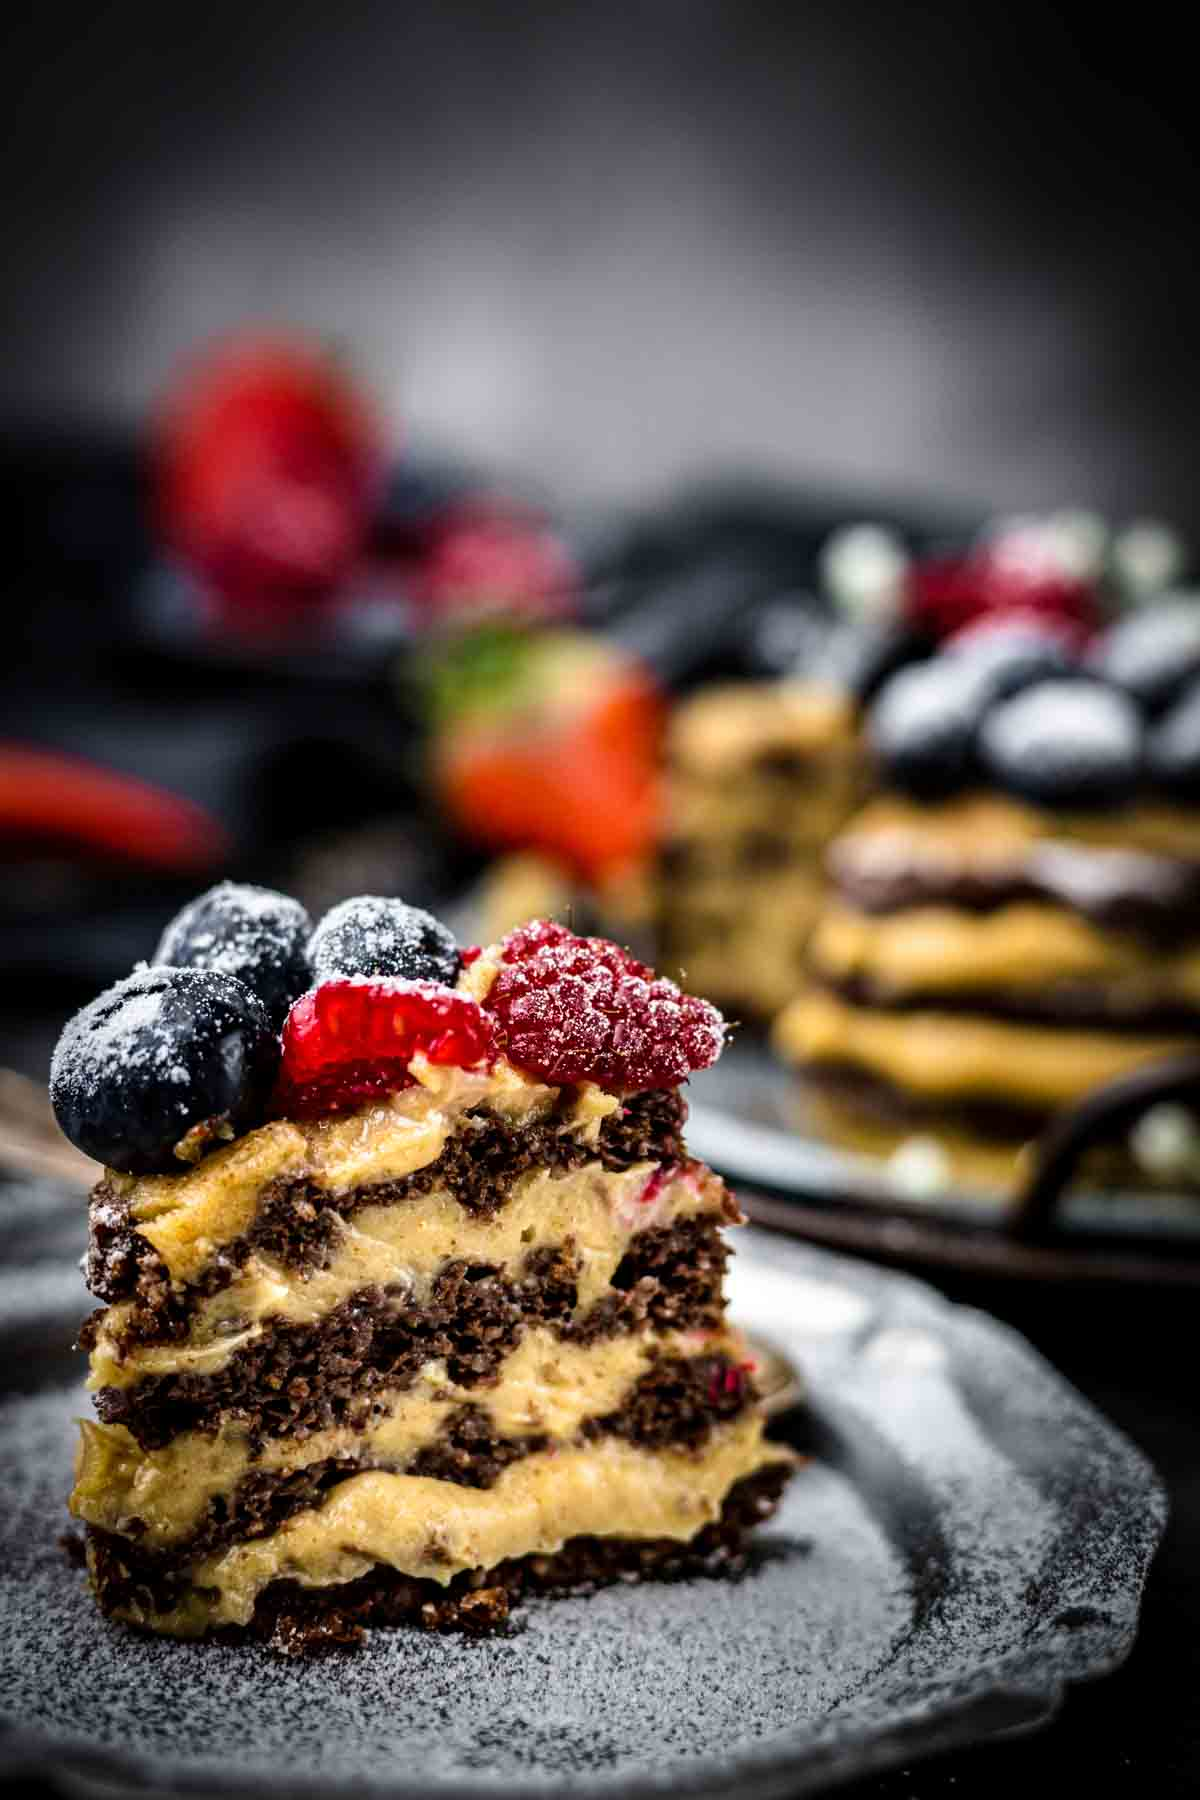 Keto Chocolate Cake single piece on a grey plate